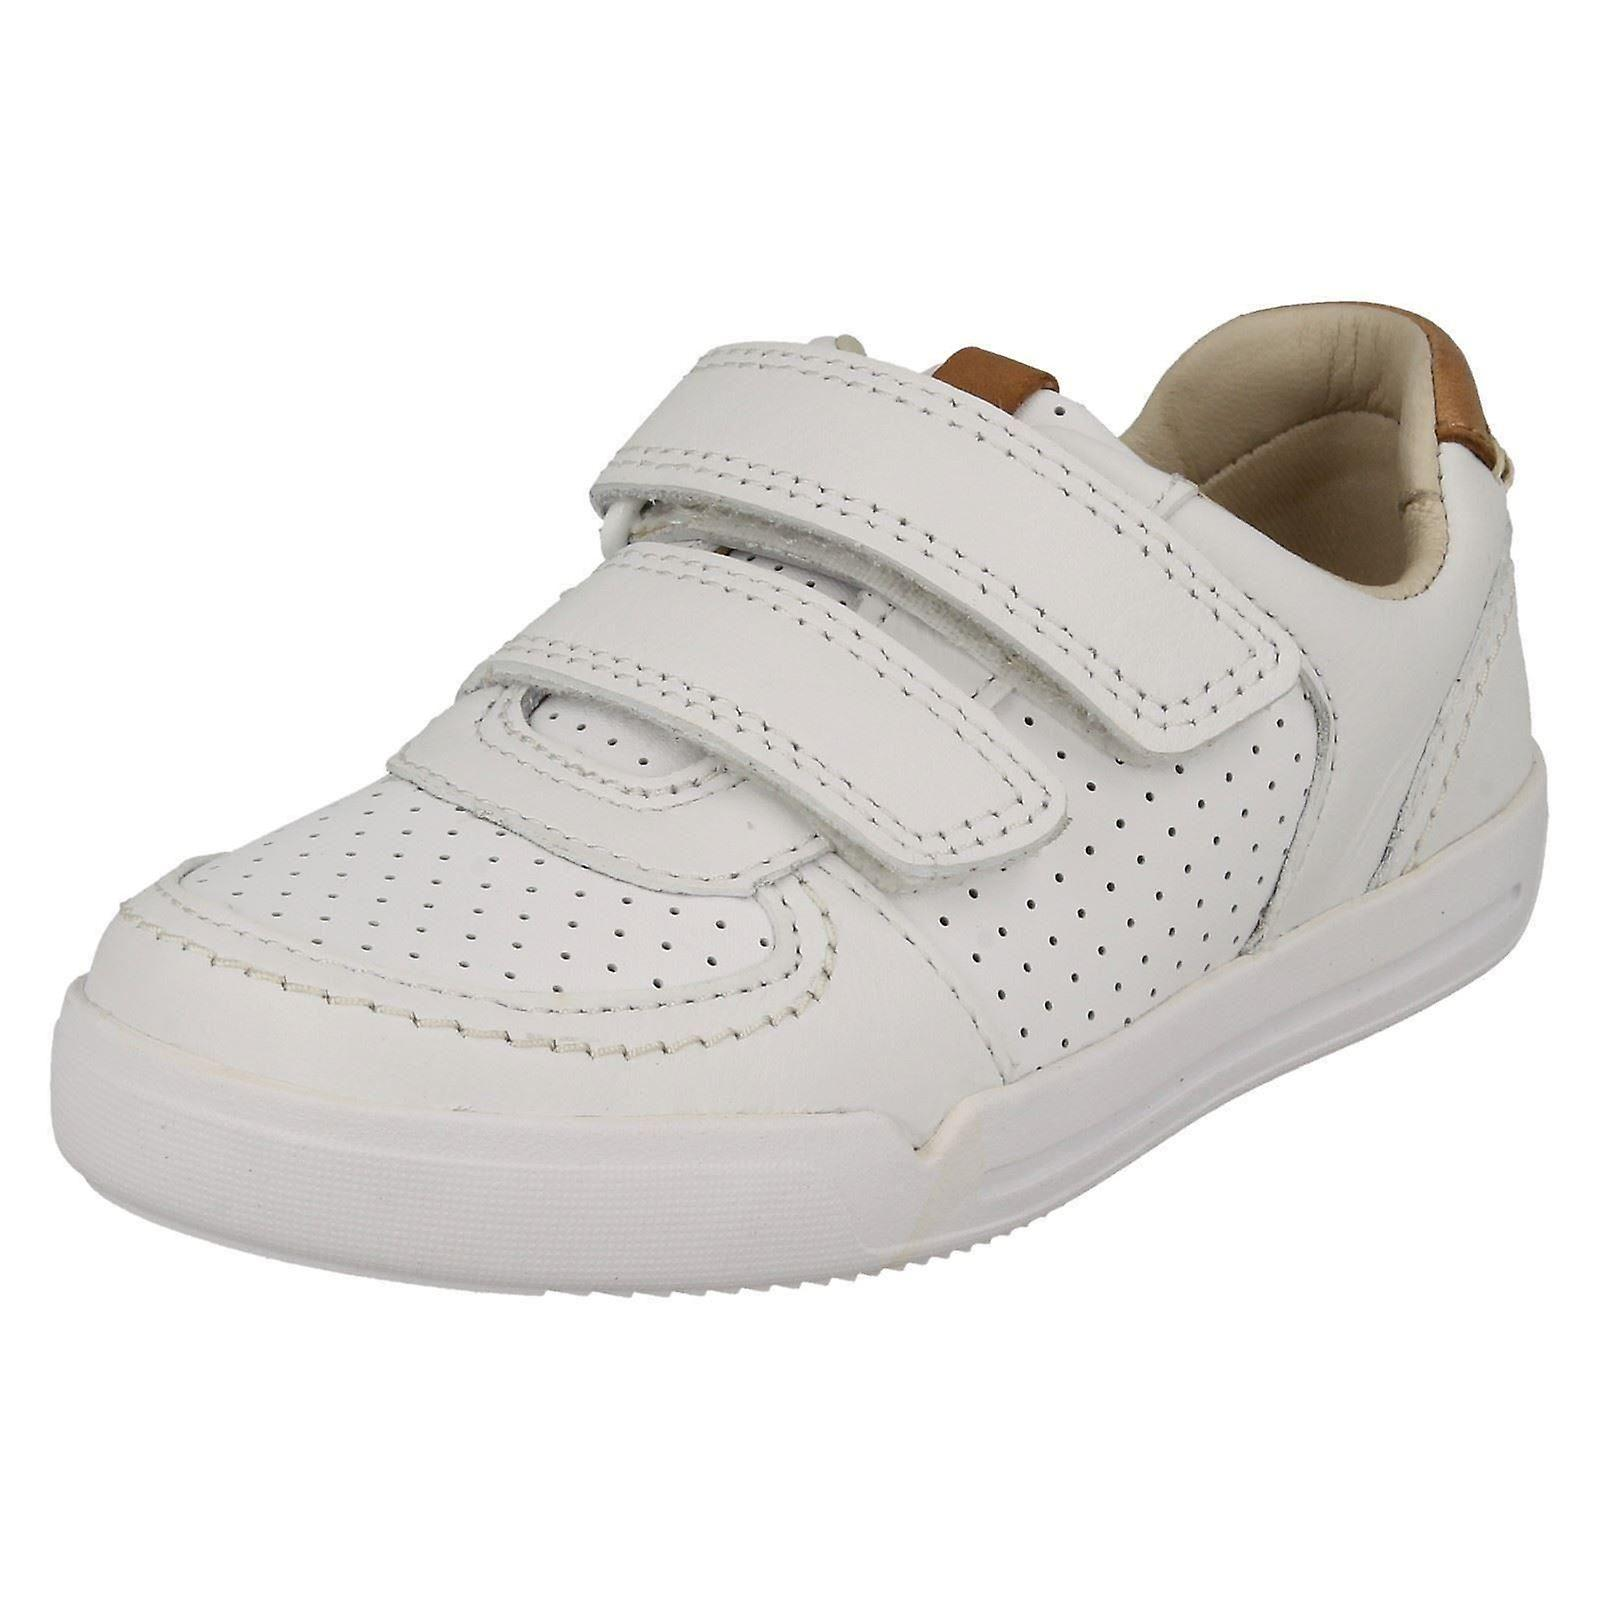 Garçons Clarks chaussures occasionnelles Mini Ezra